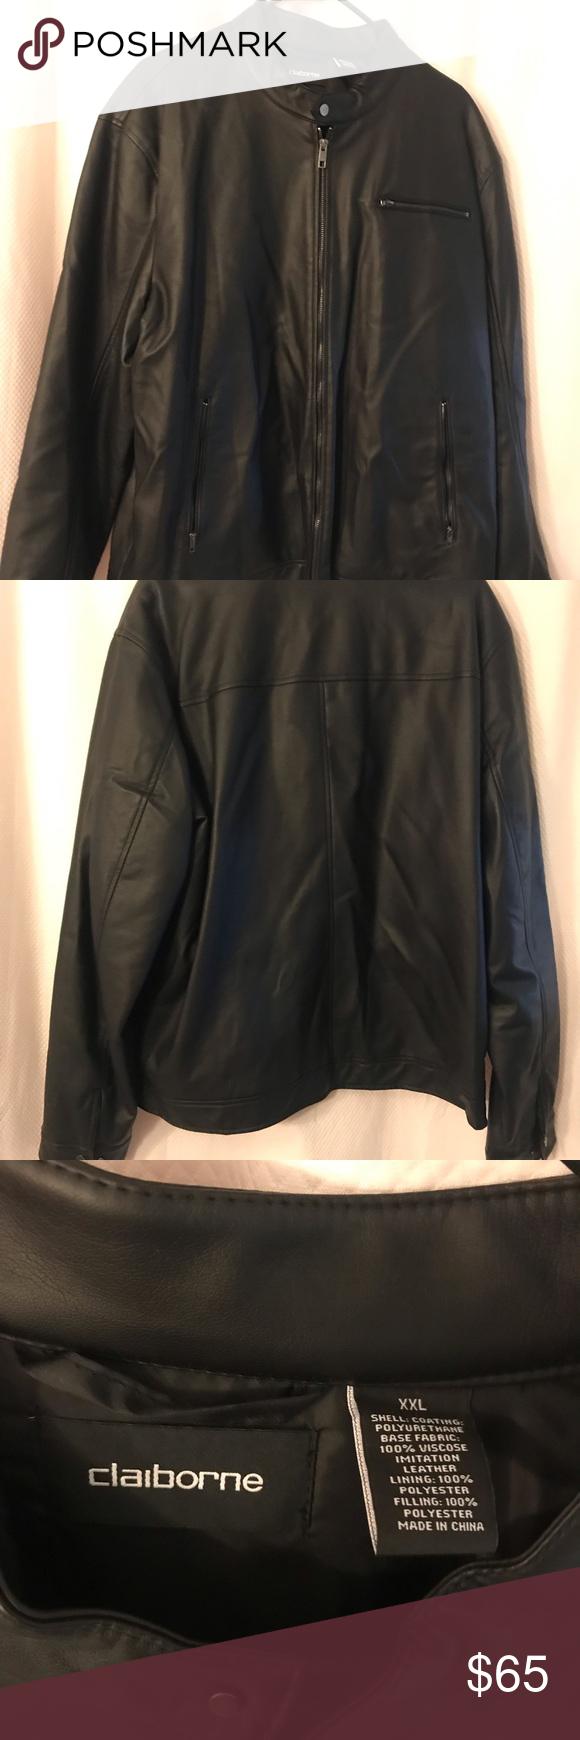 Liz Claiborne Men S Vegan Leather Jacket Leather Jacket Vegan Leather Jacket Vegan Leather